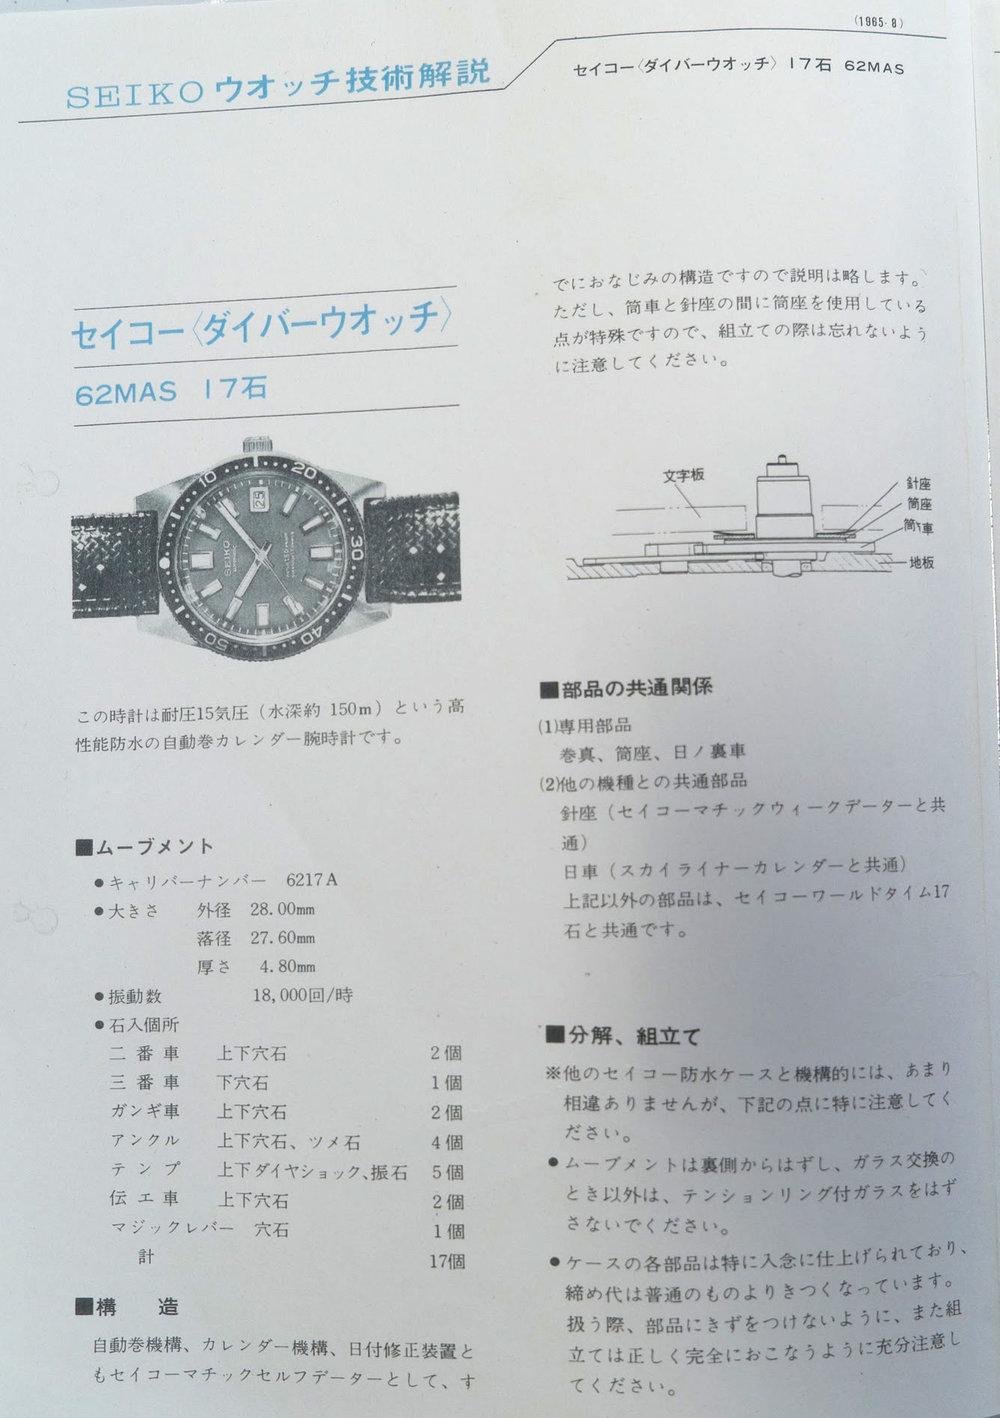 62MAS Seiko News